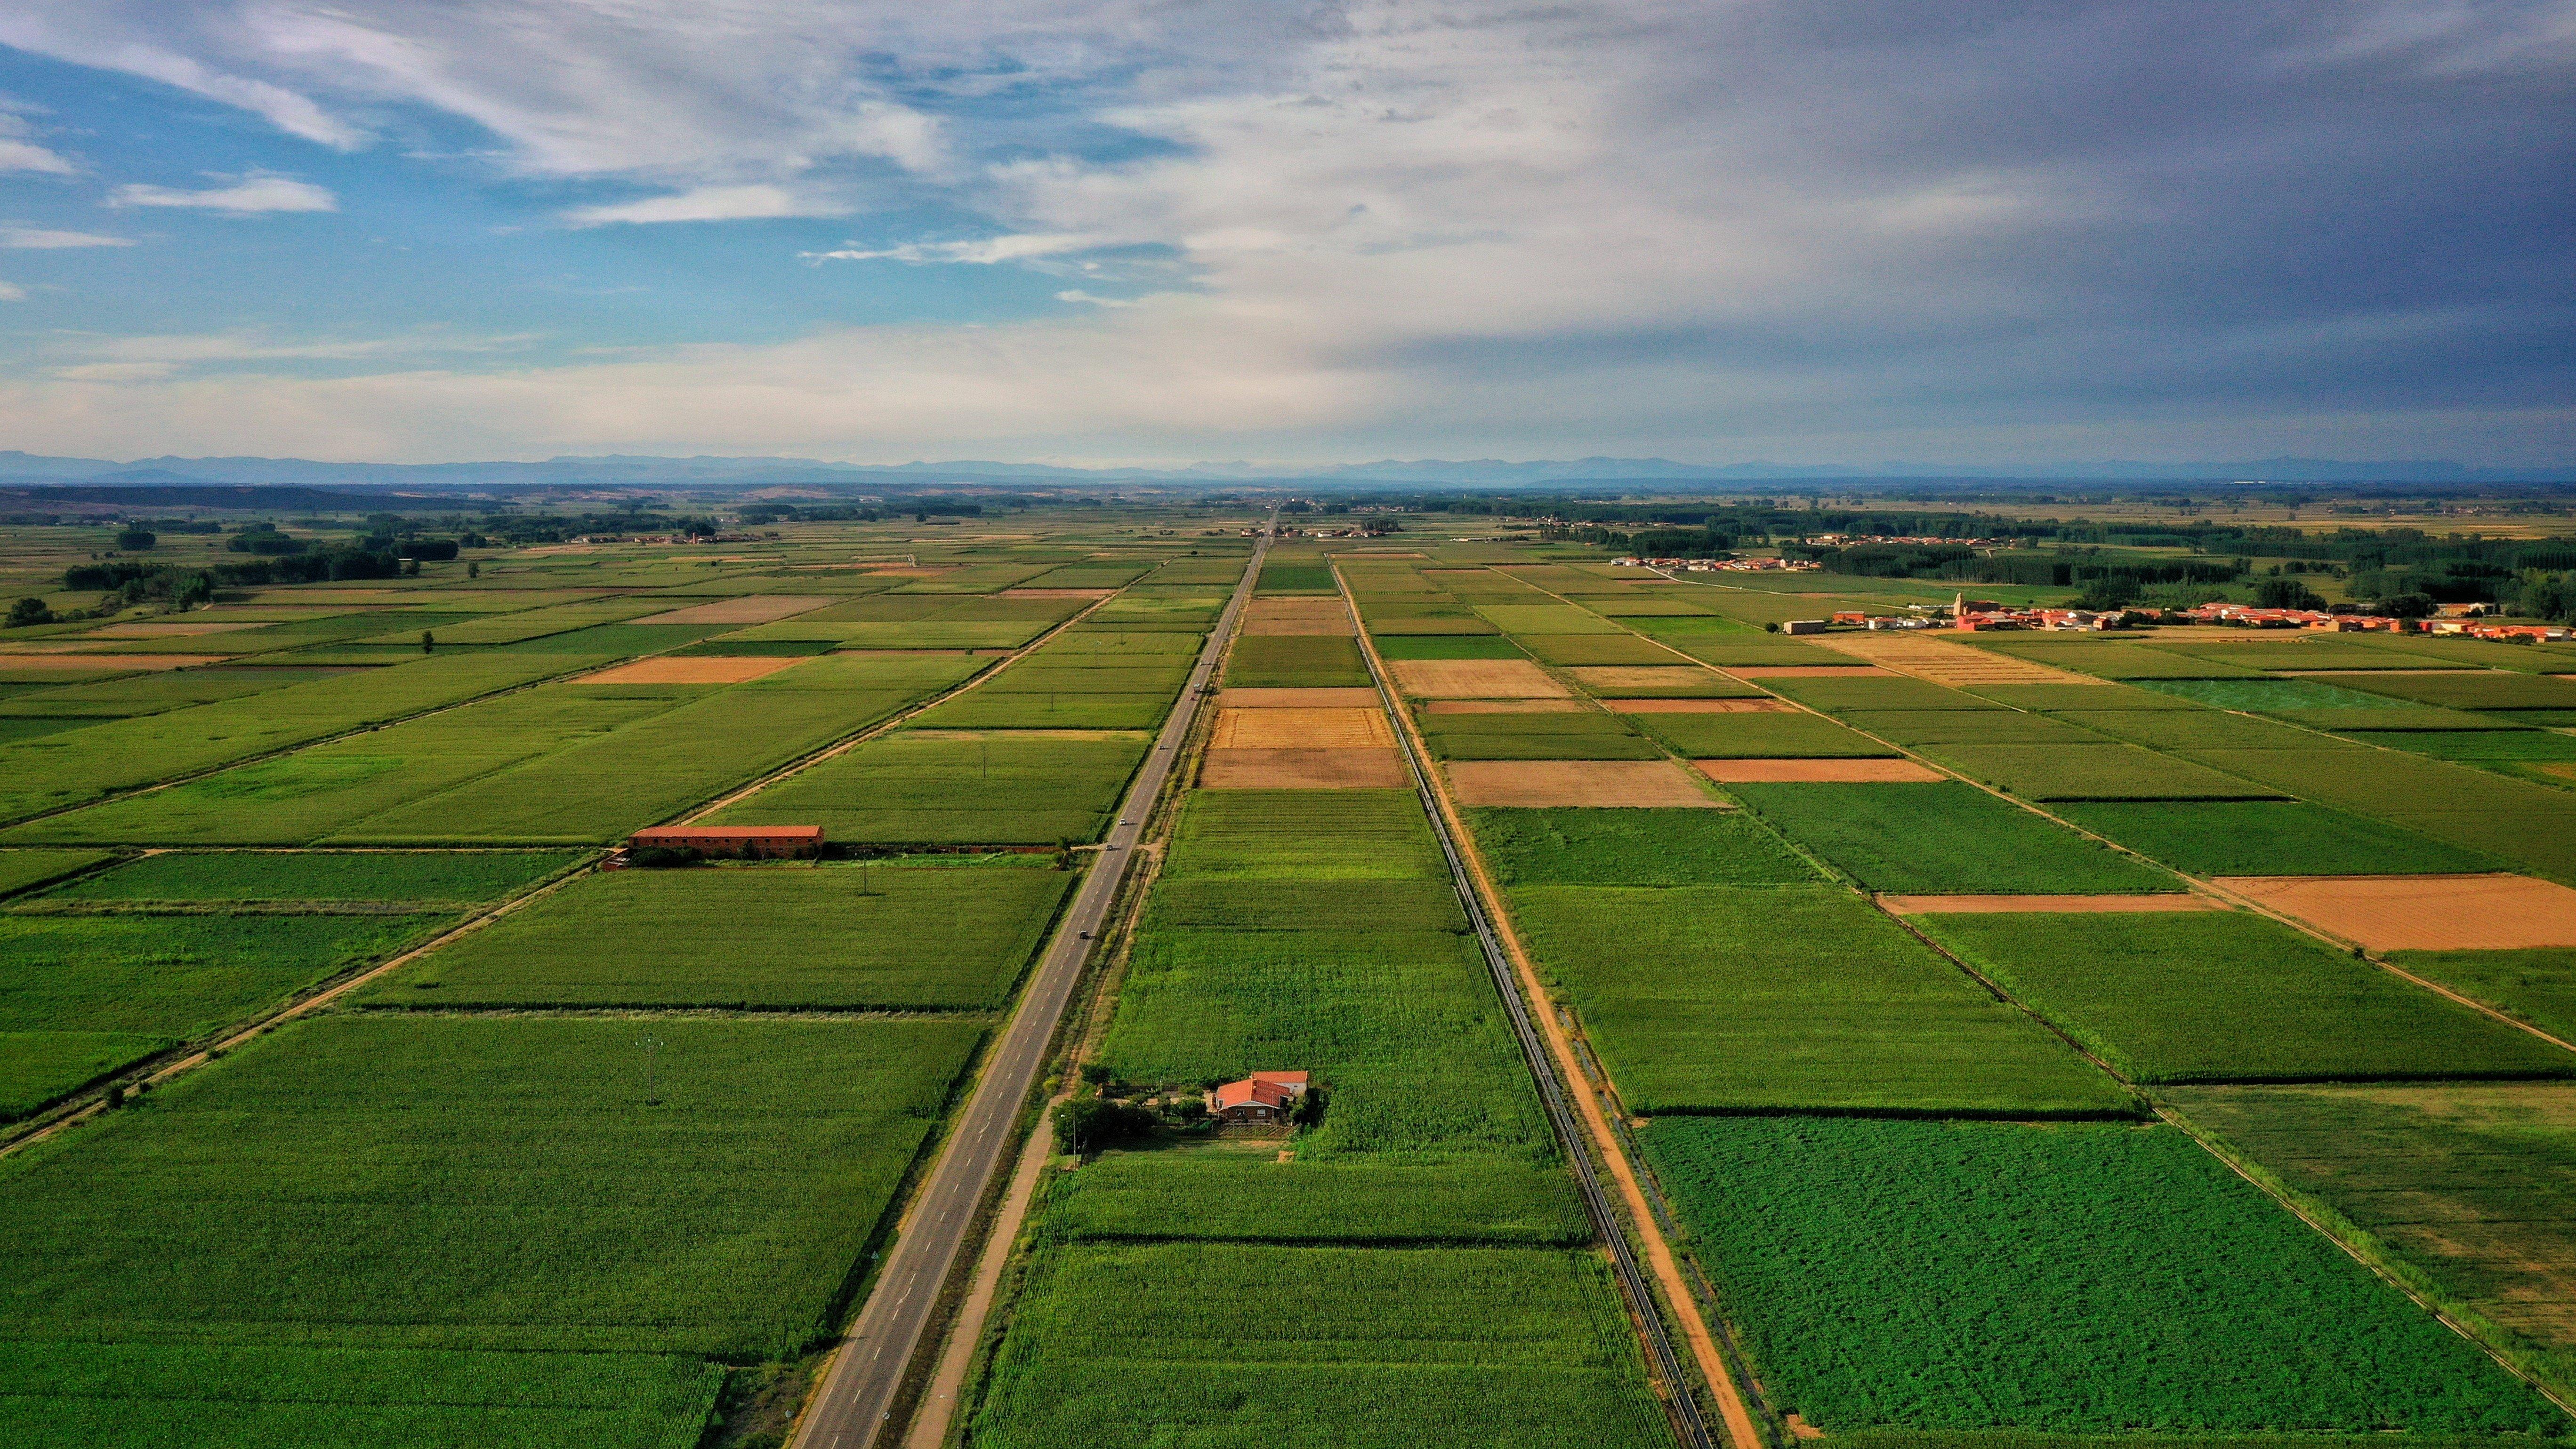 Vista aérea de campos de cultivo